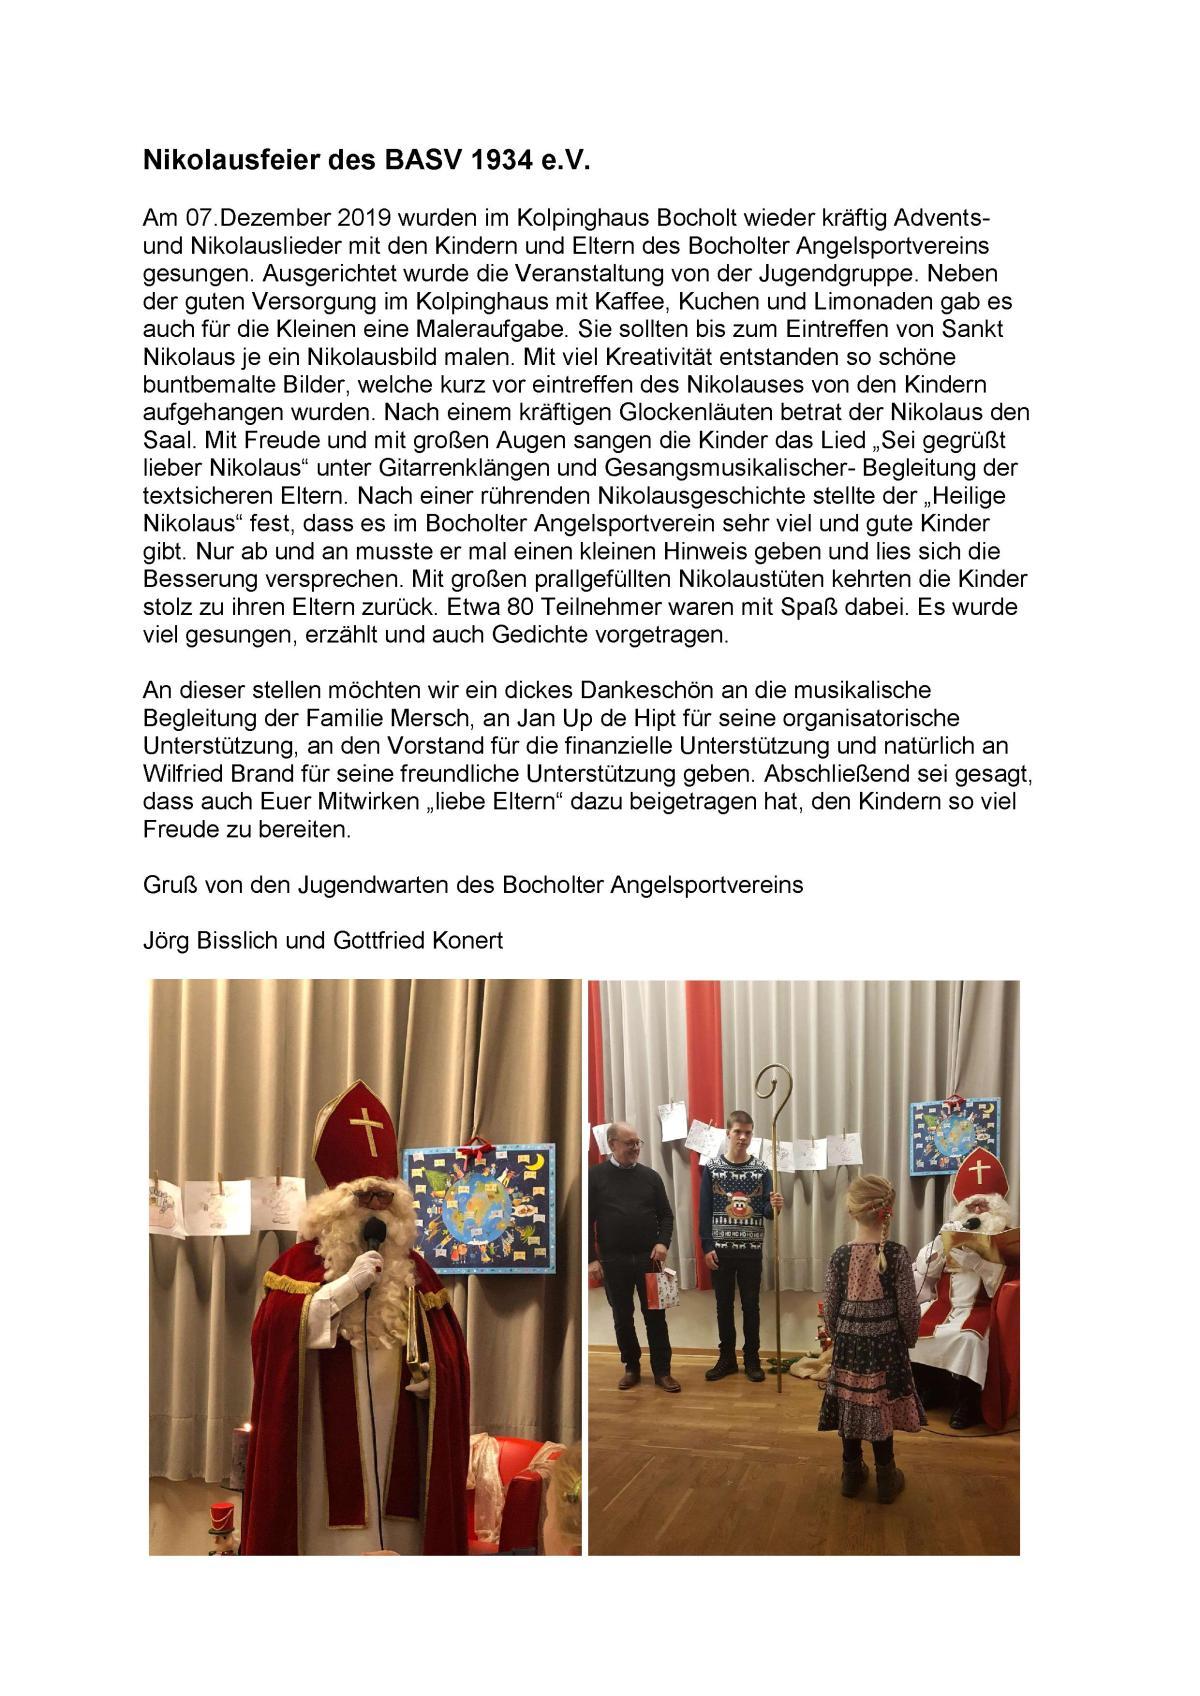 Nikolausbericht 2019 BASV